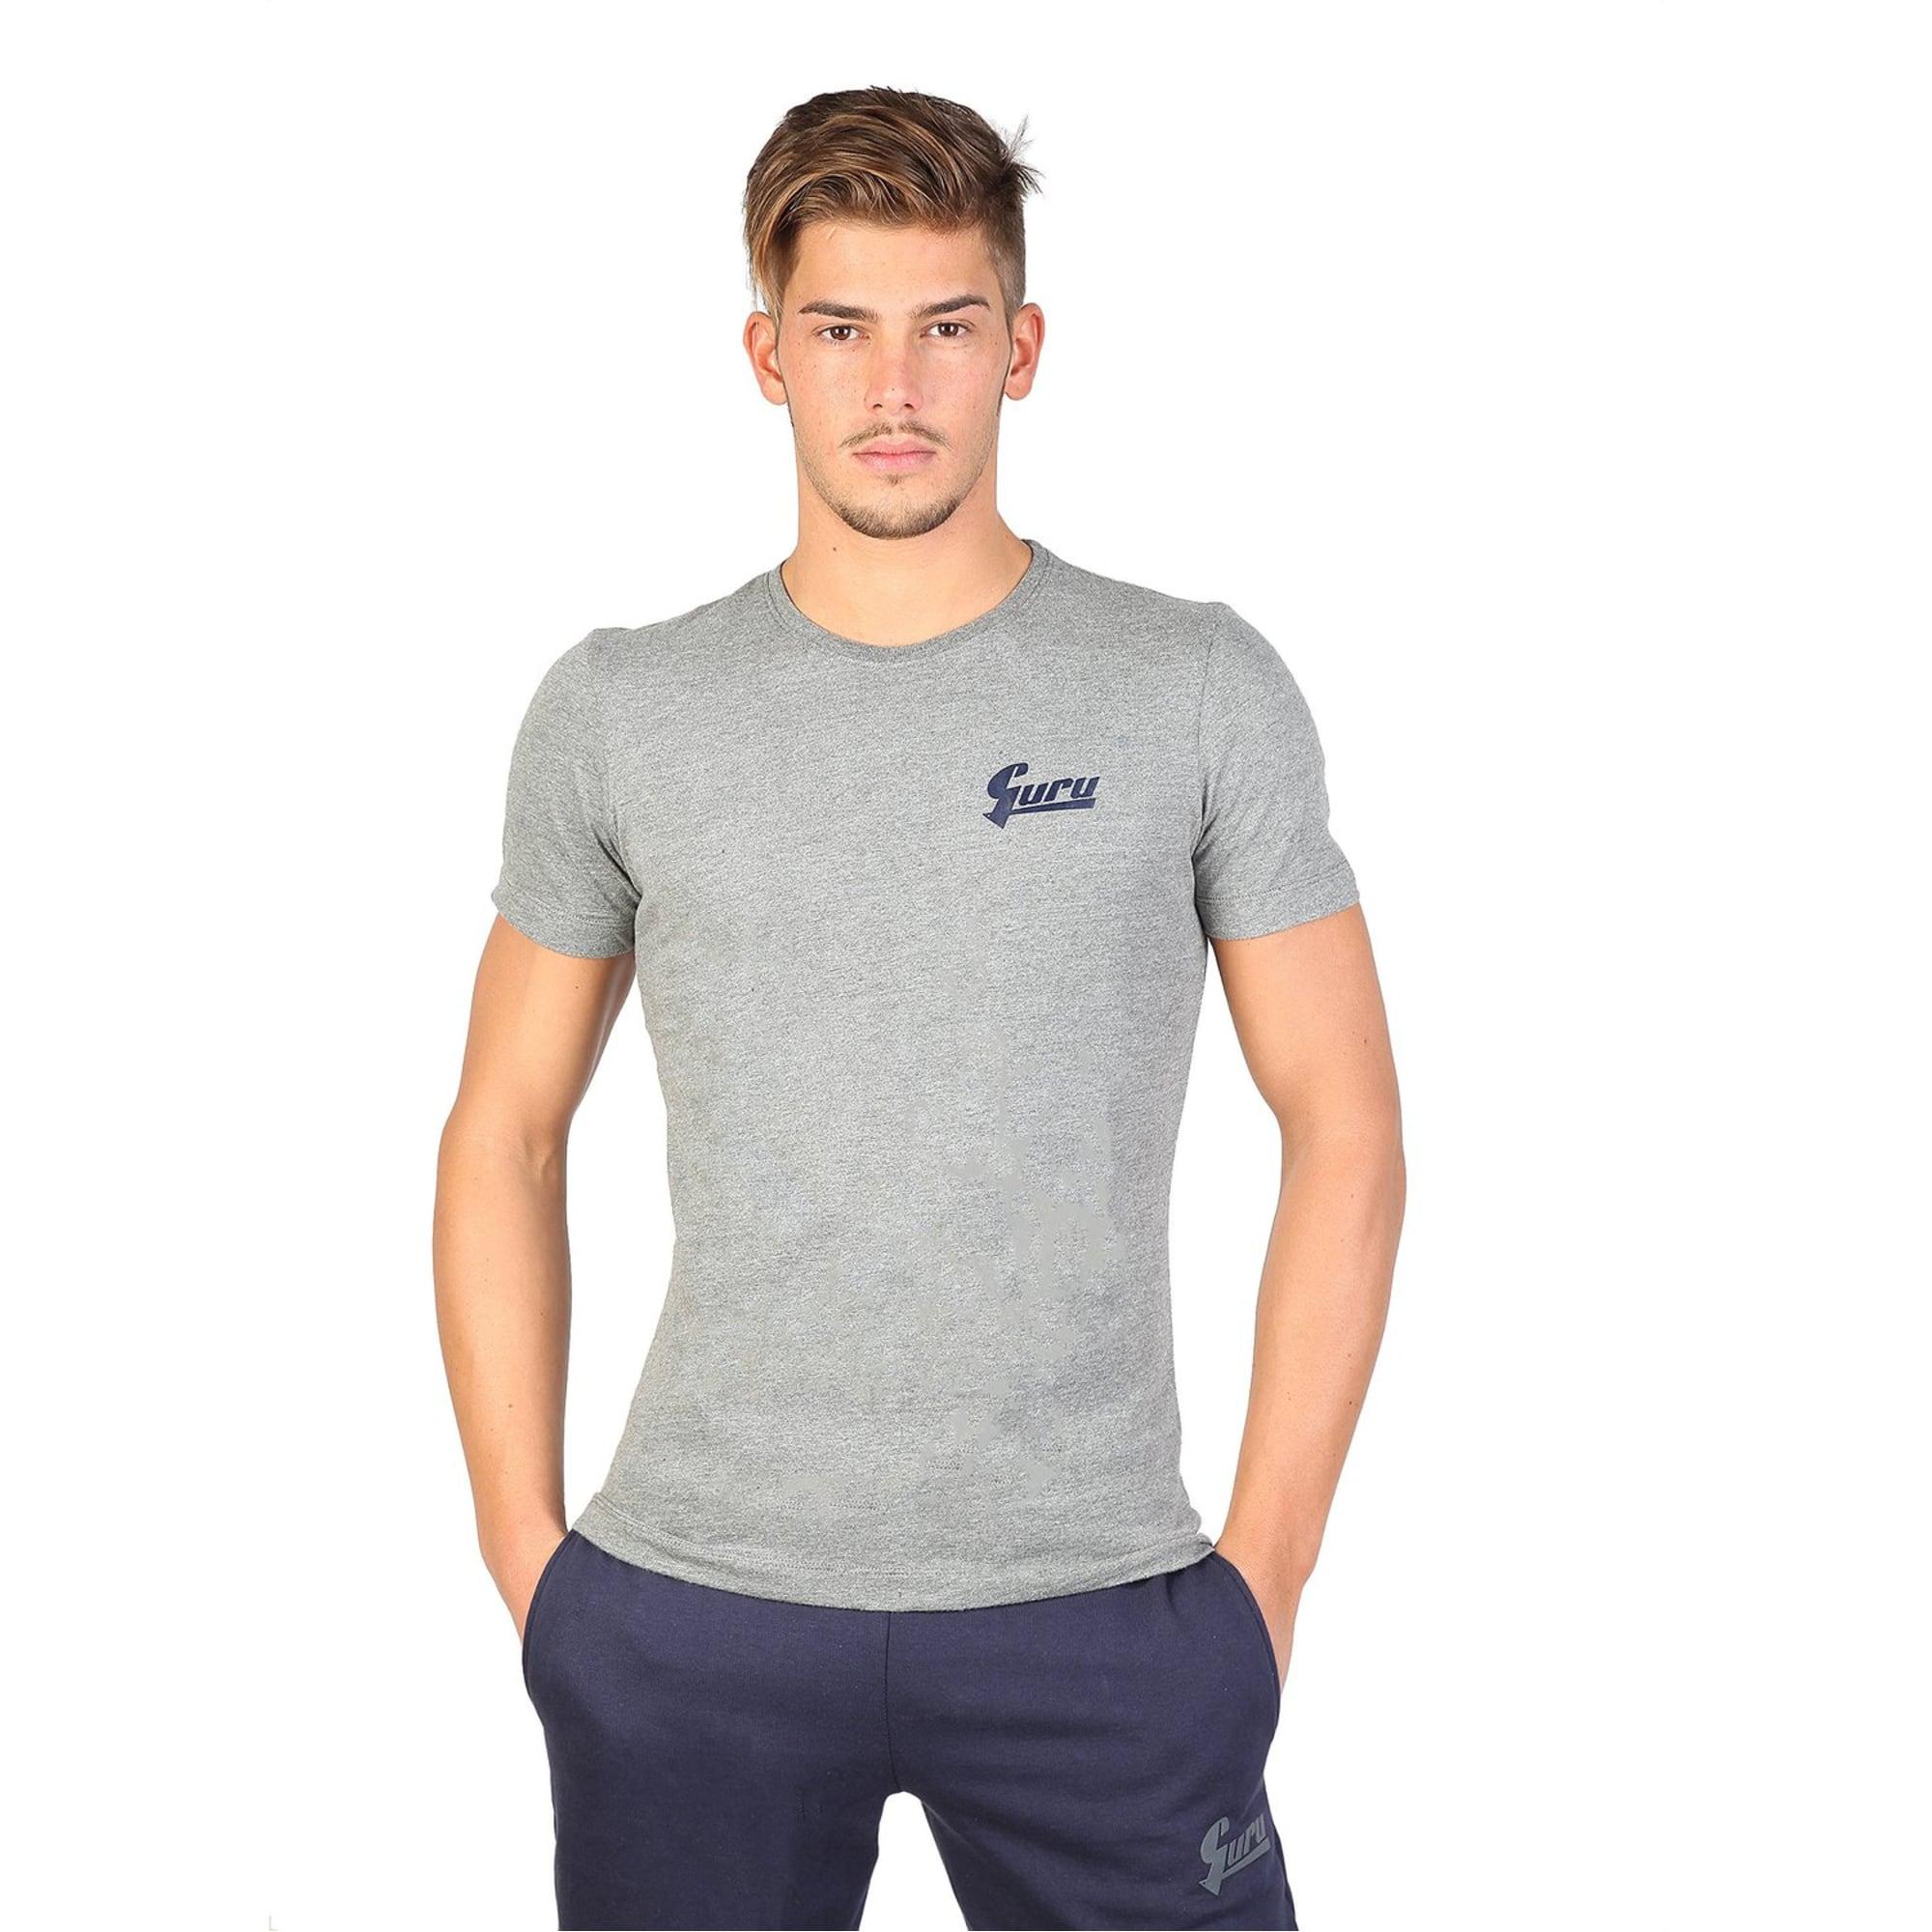 Tee-shirt GURU Gris, anthracite